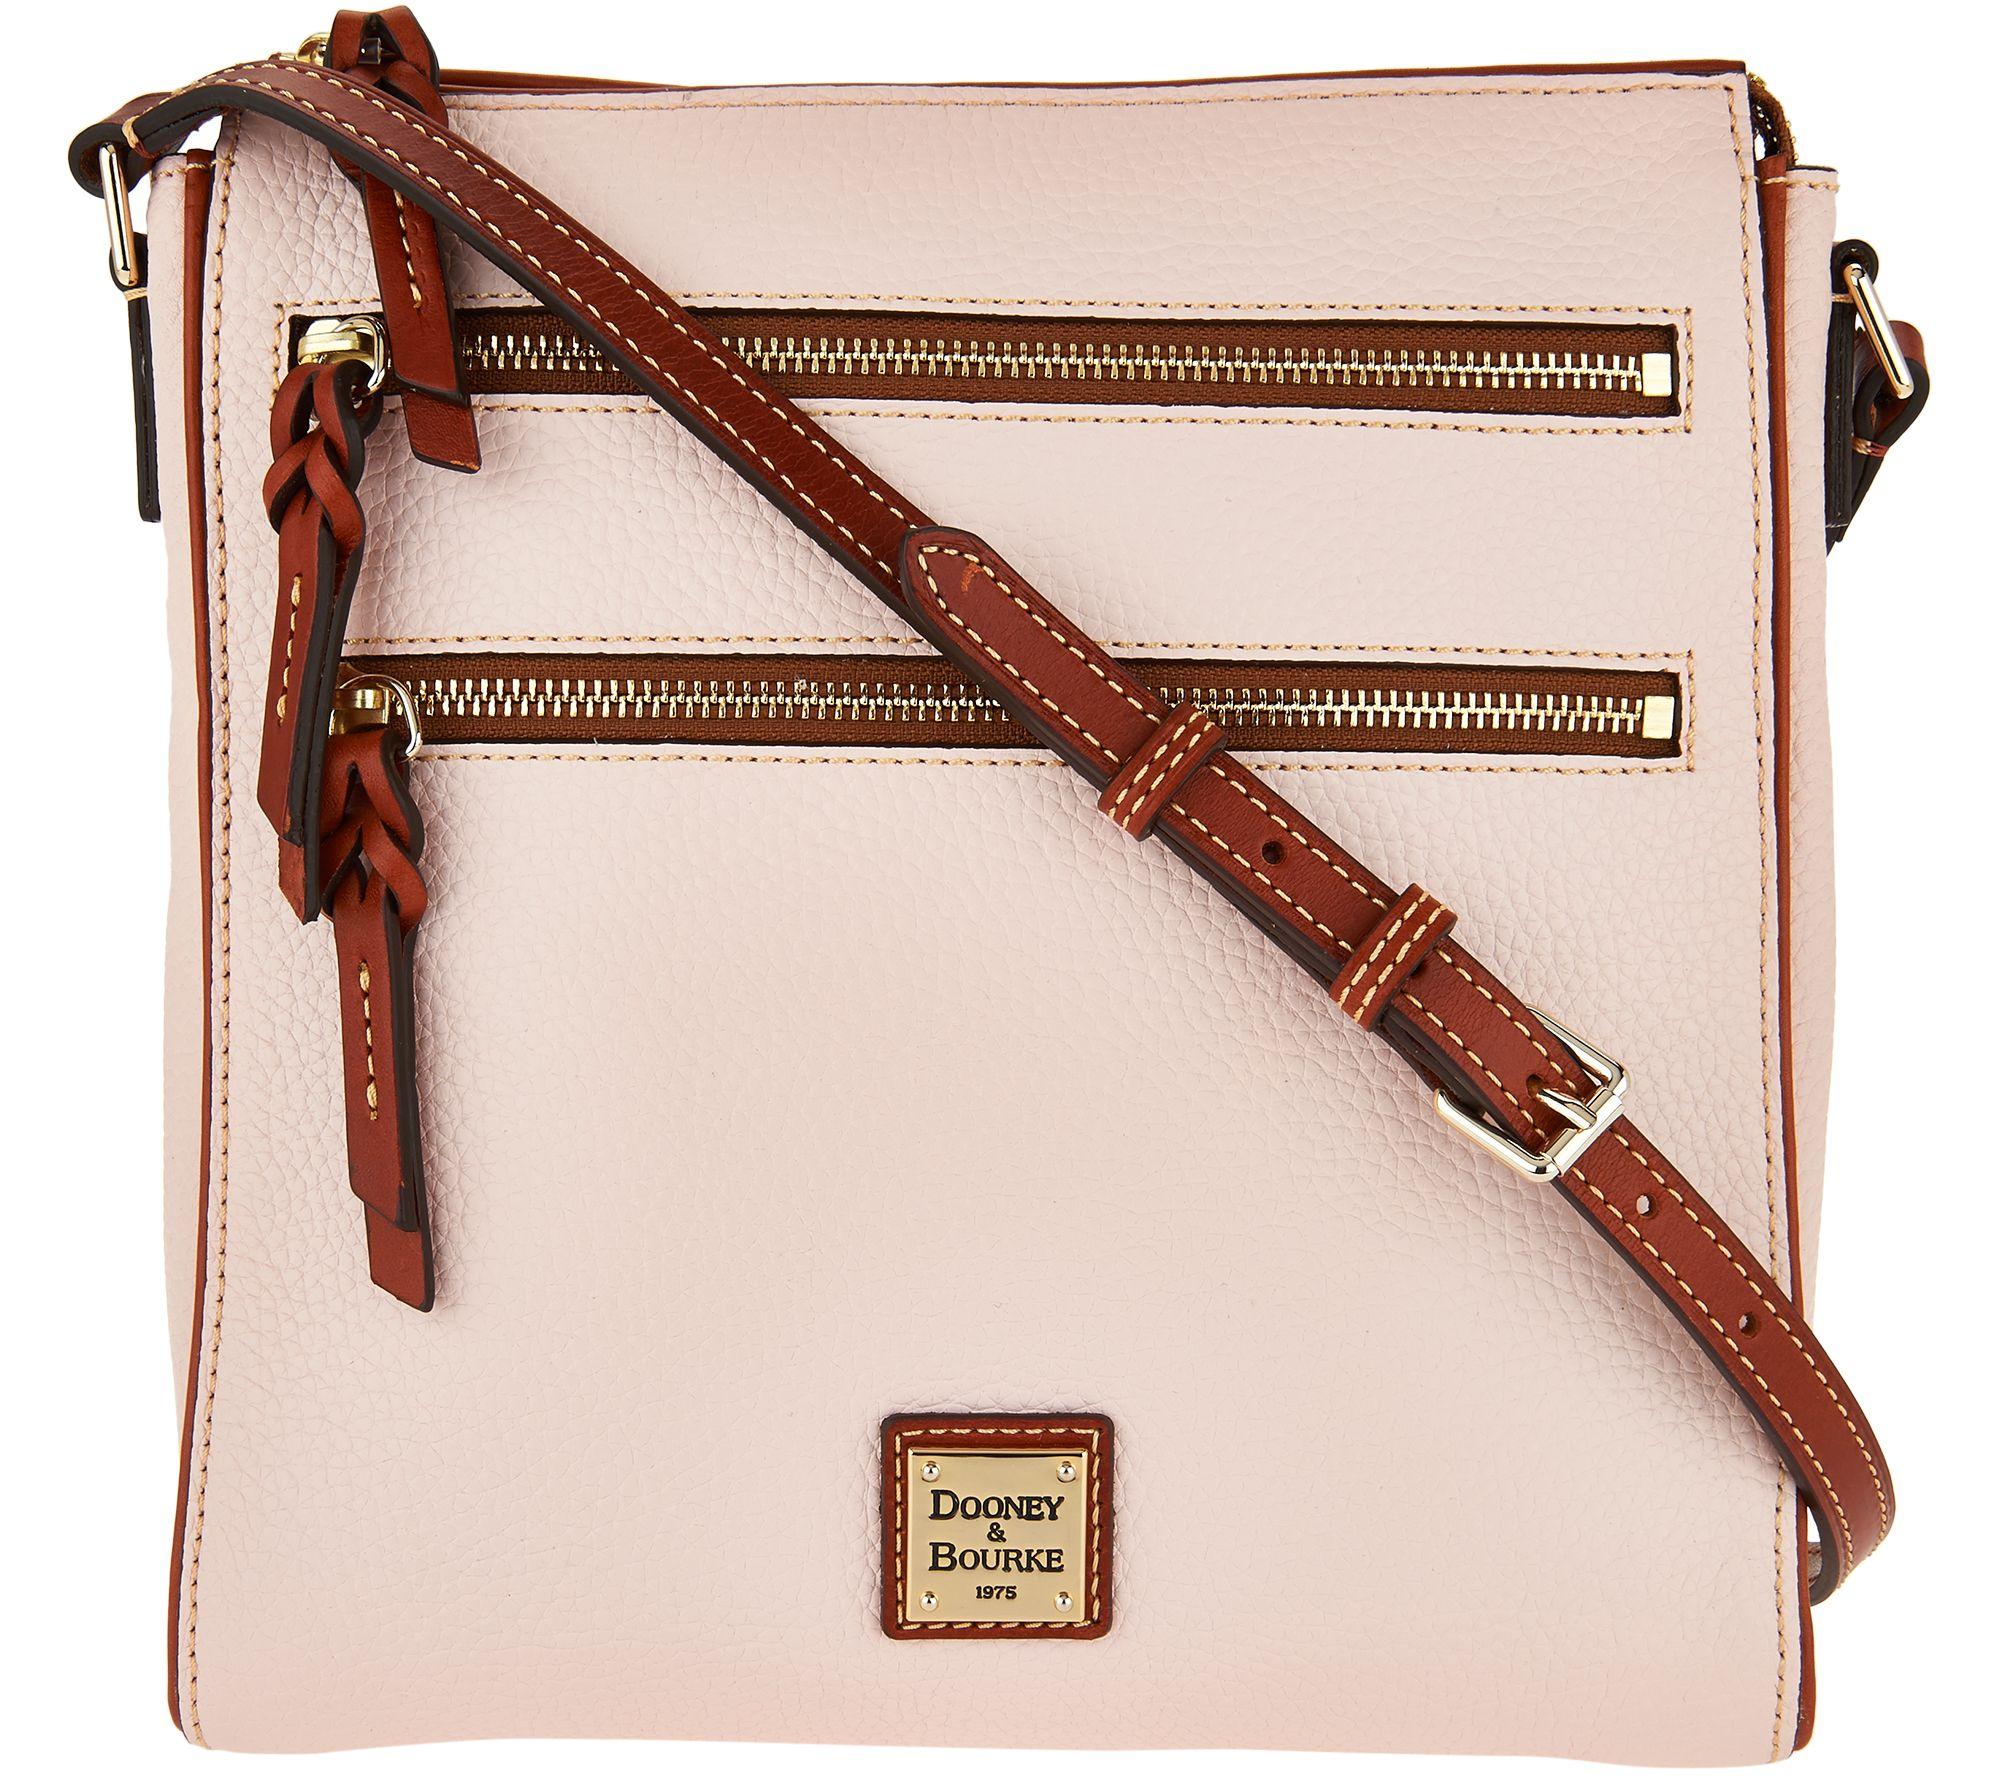 clearance designer handbags p5ys  Dooney & Bourke Pebble Leather Triple Zip Crossbody Handbag